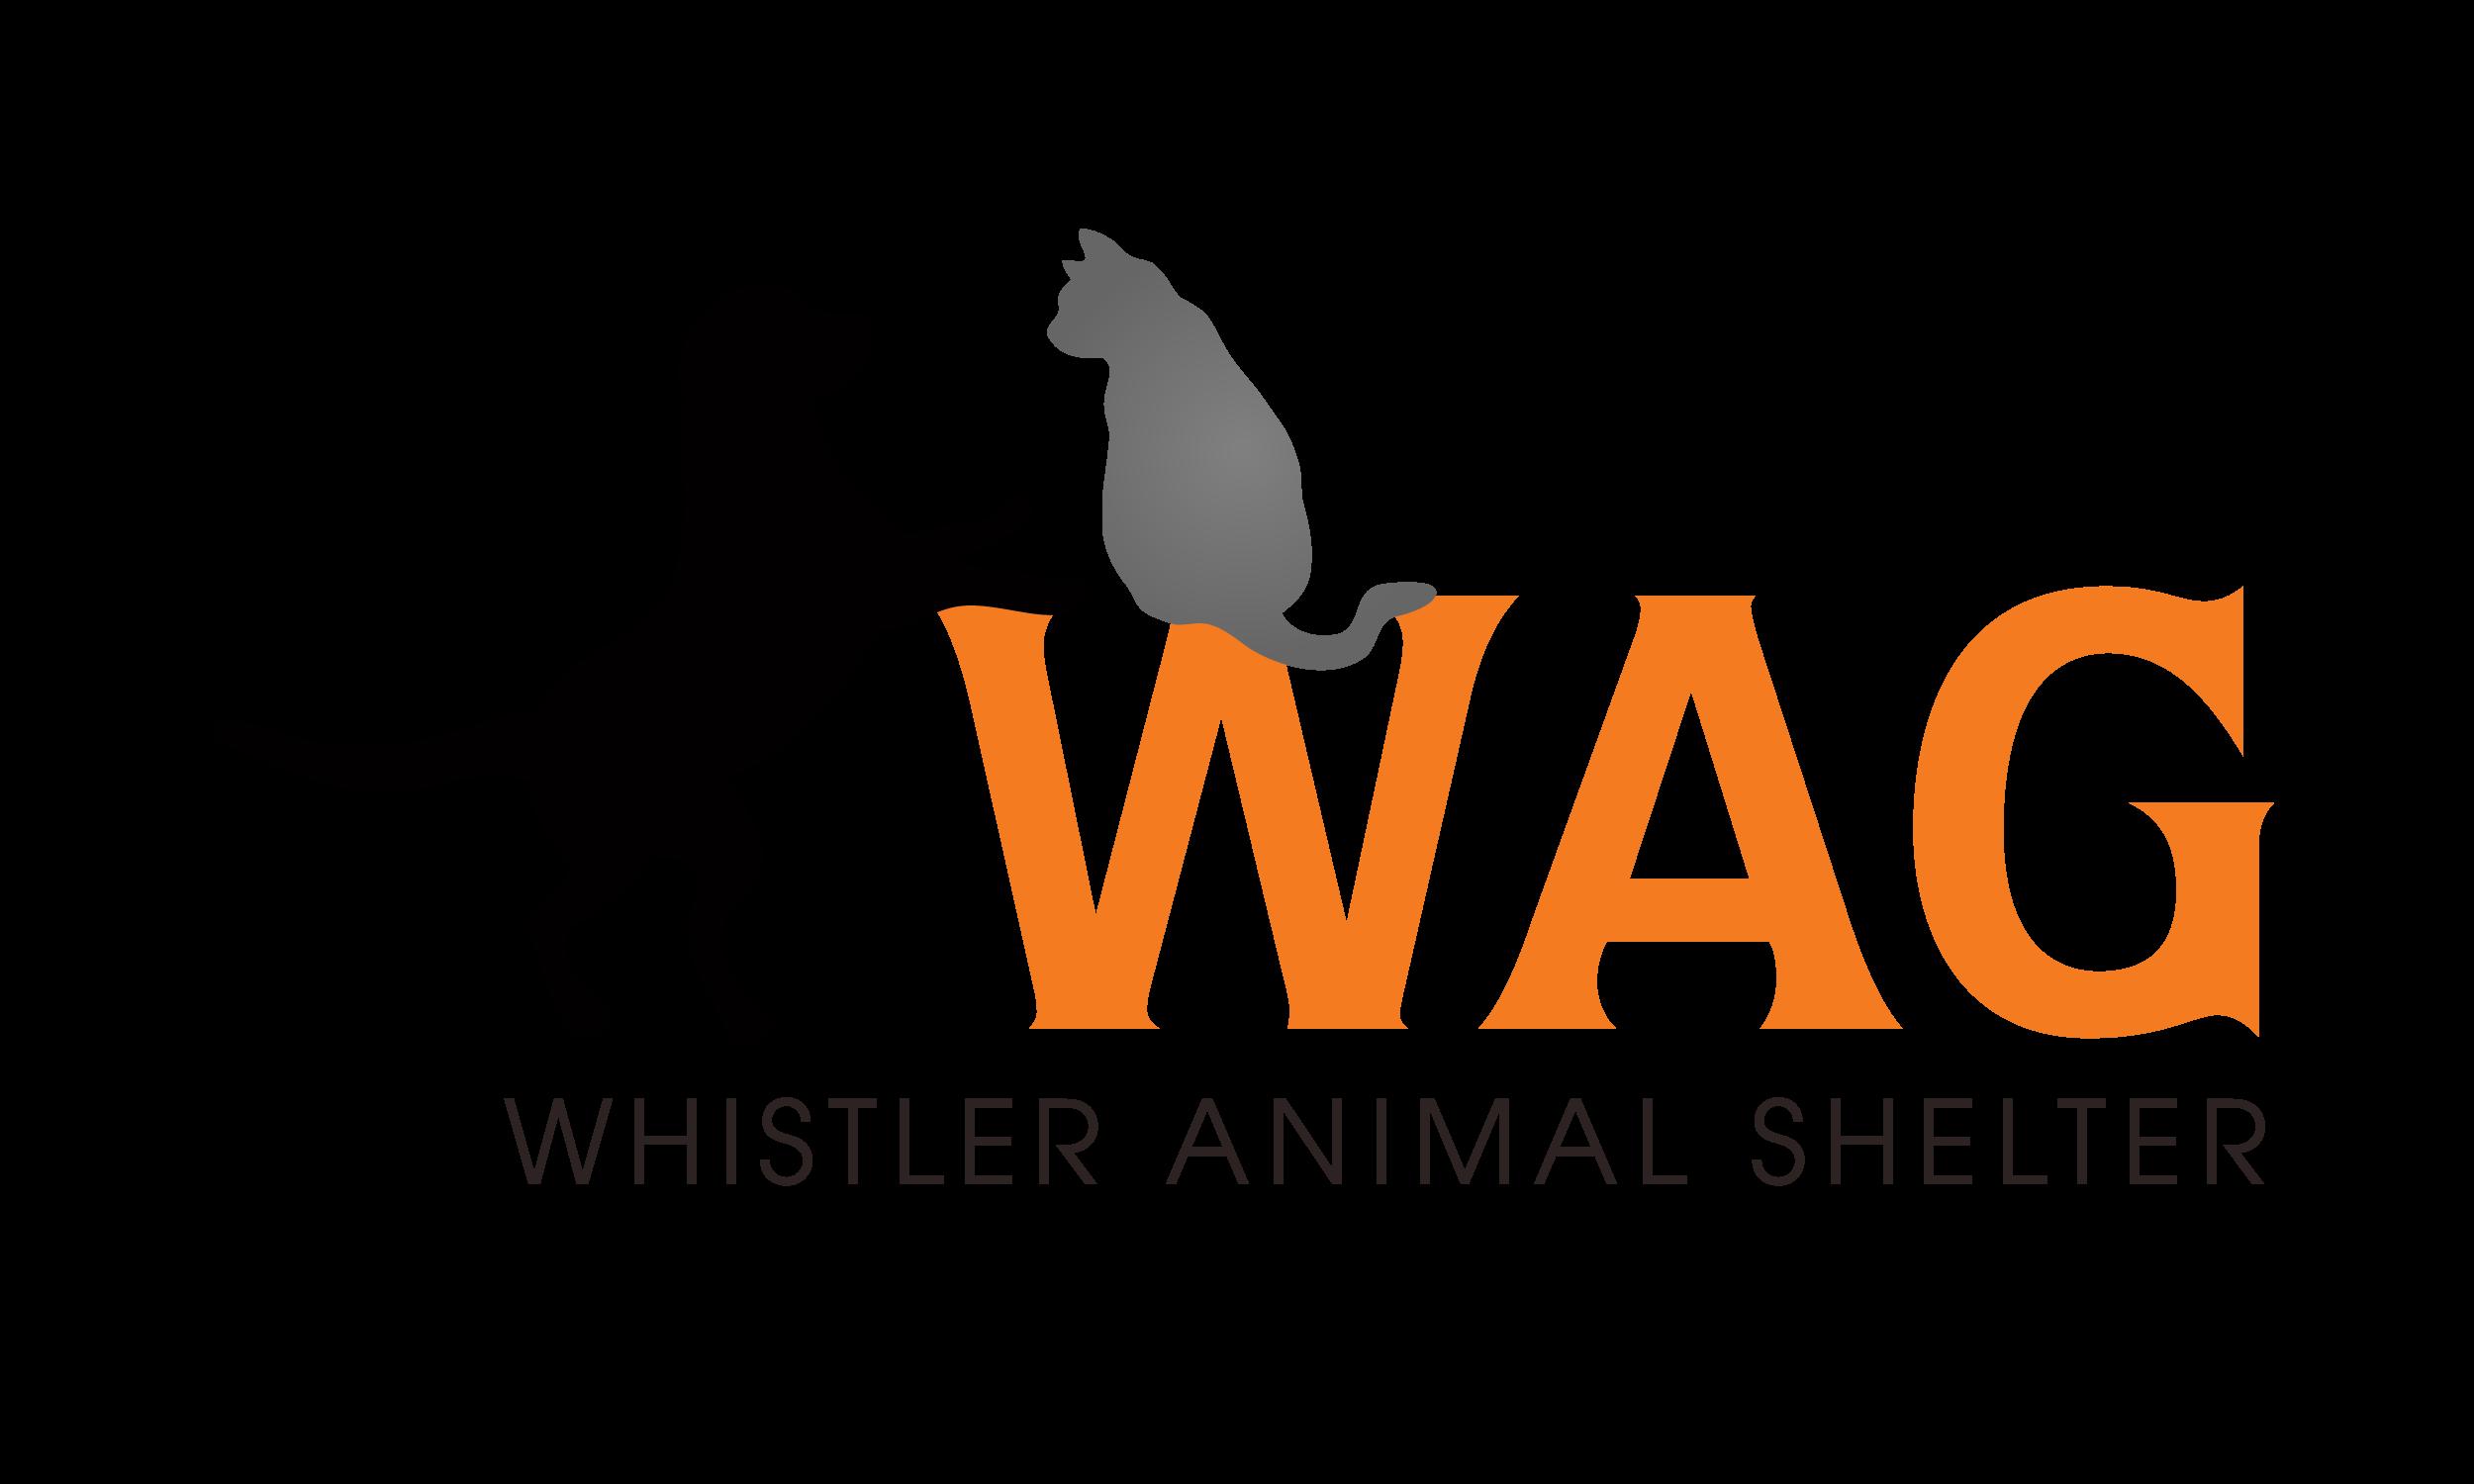 WAG - Whistler Animal Shelter